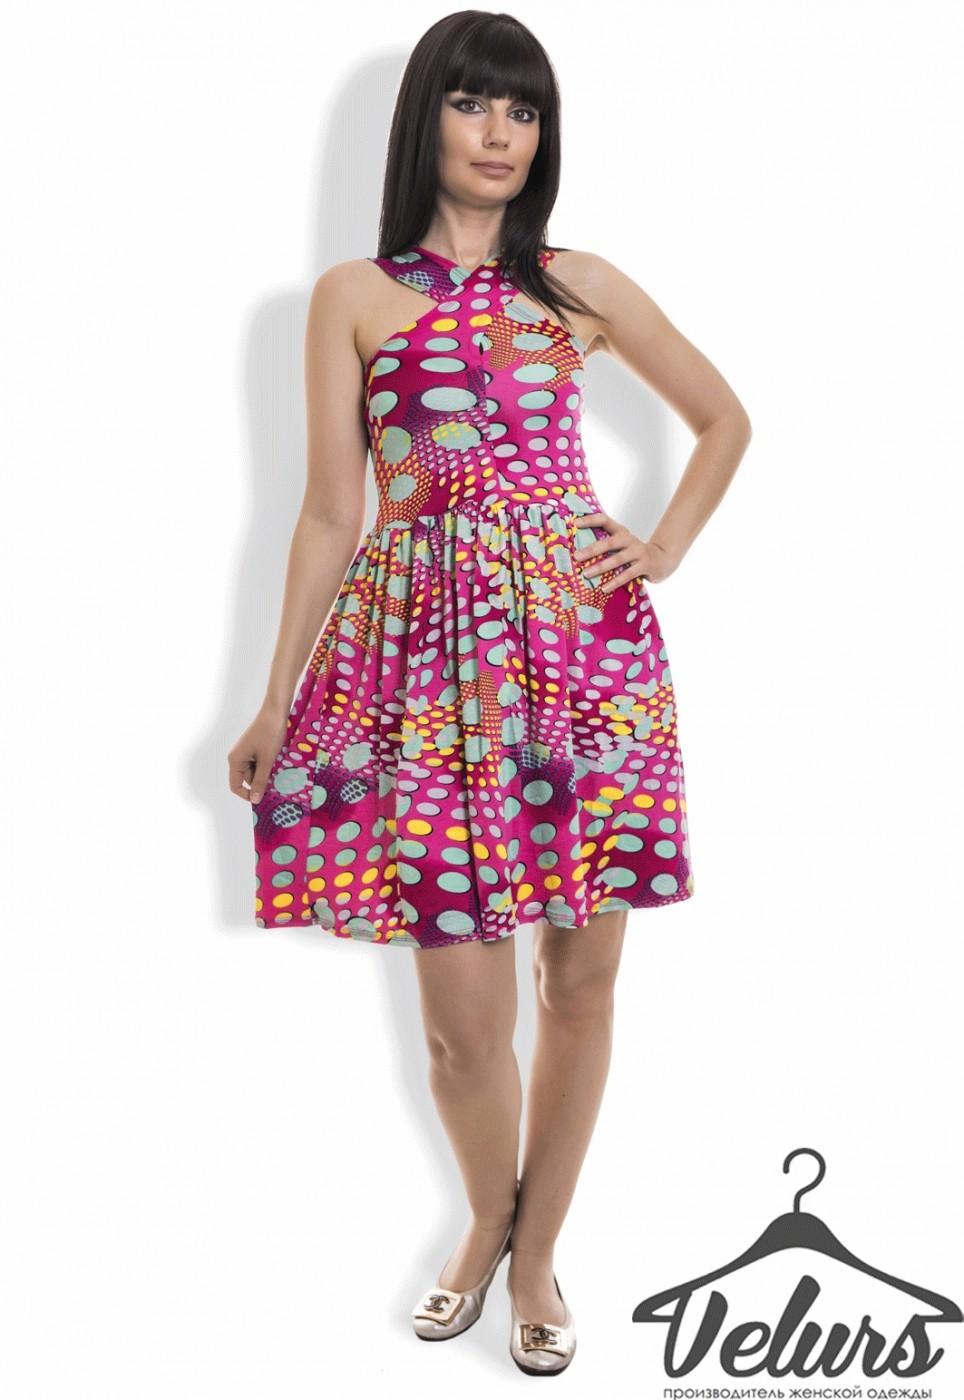 Velurs: Платье 21962 - фото 4